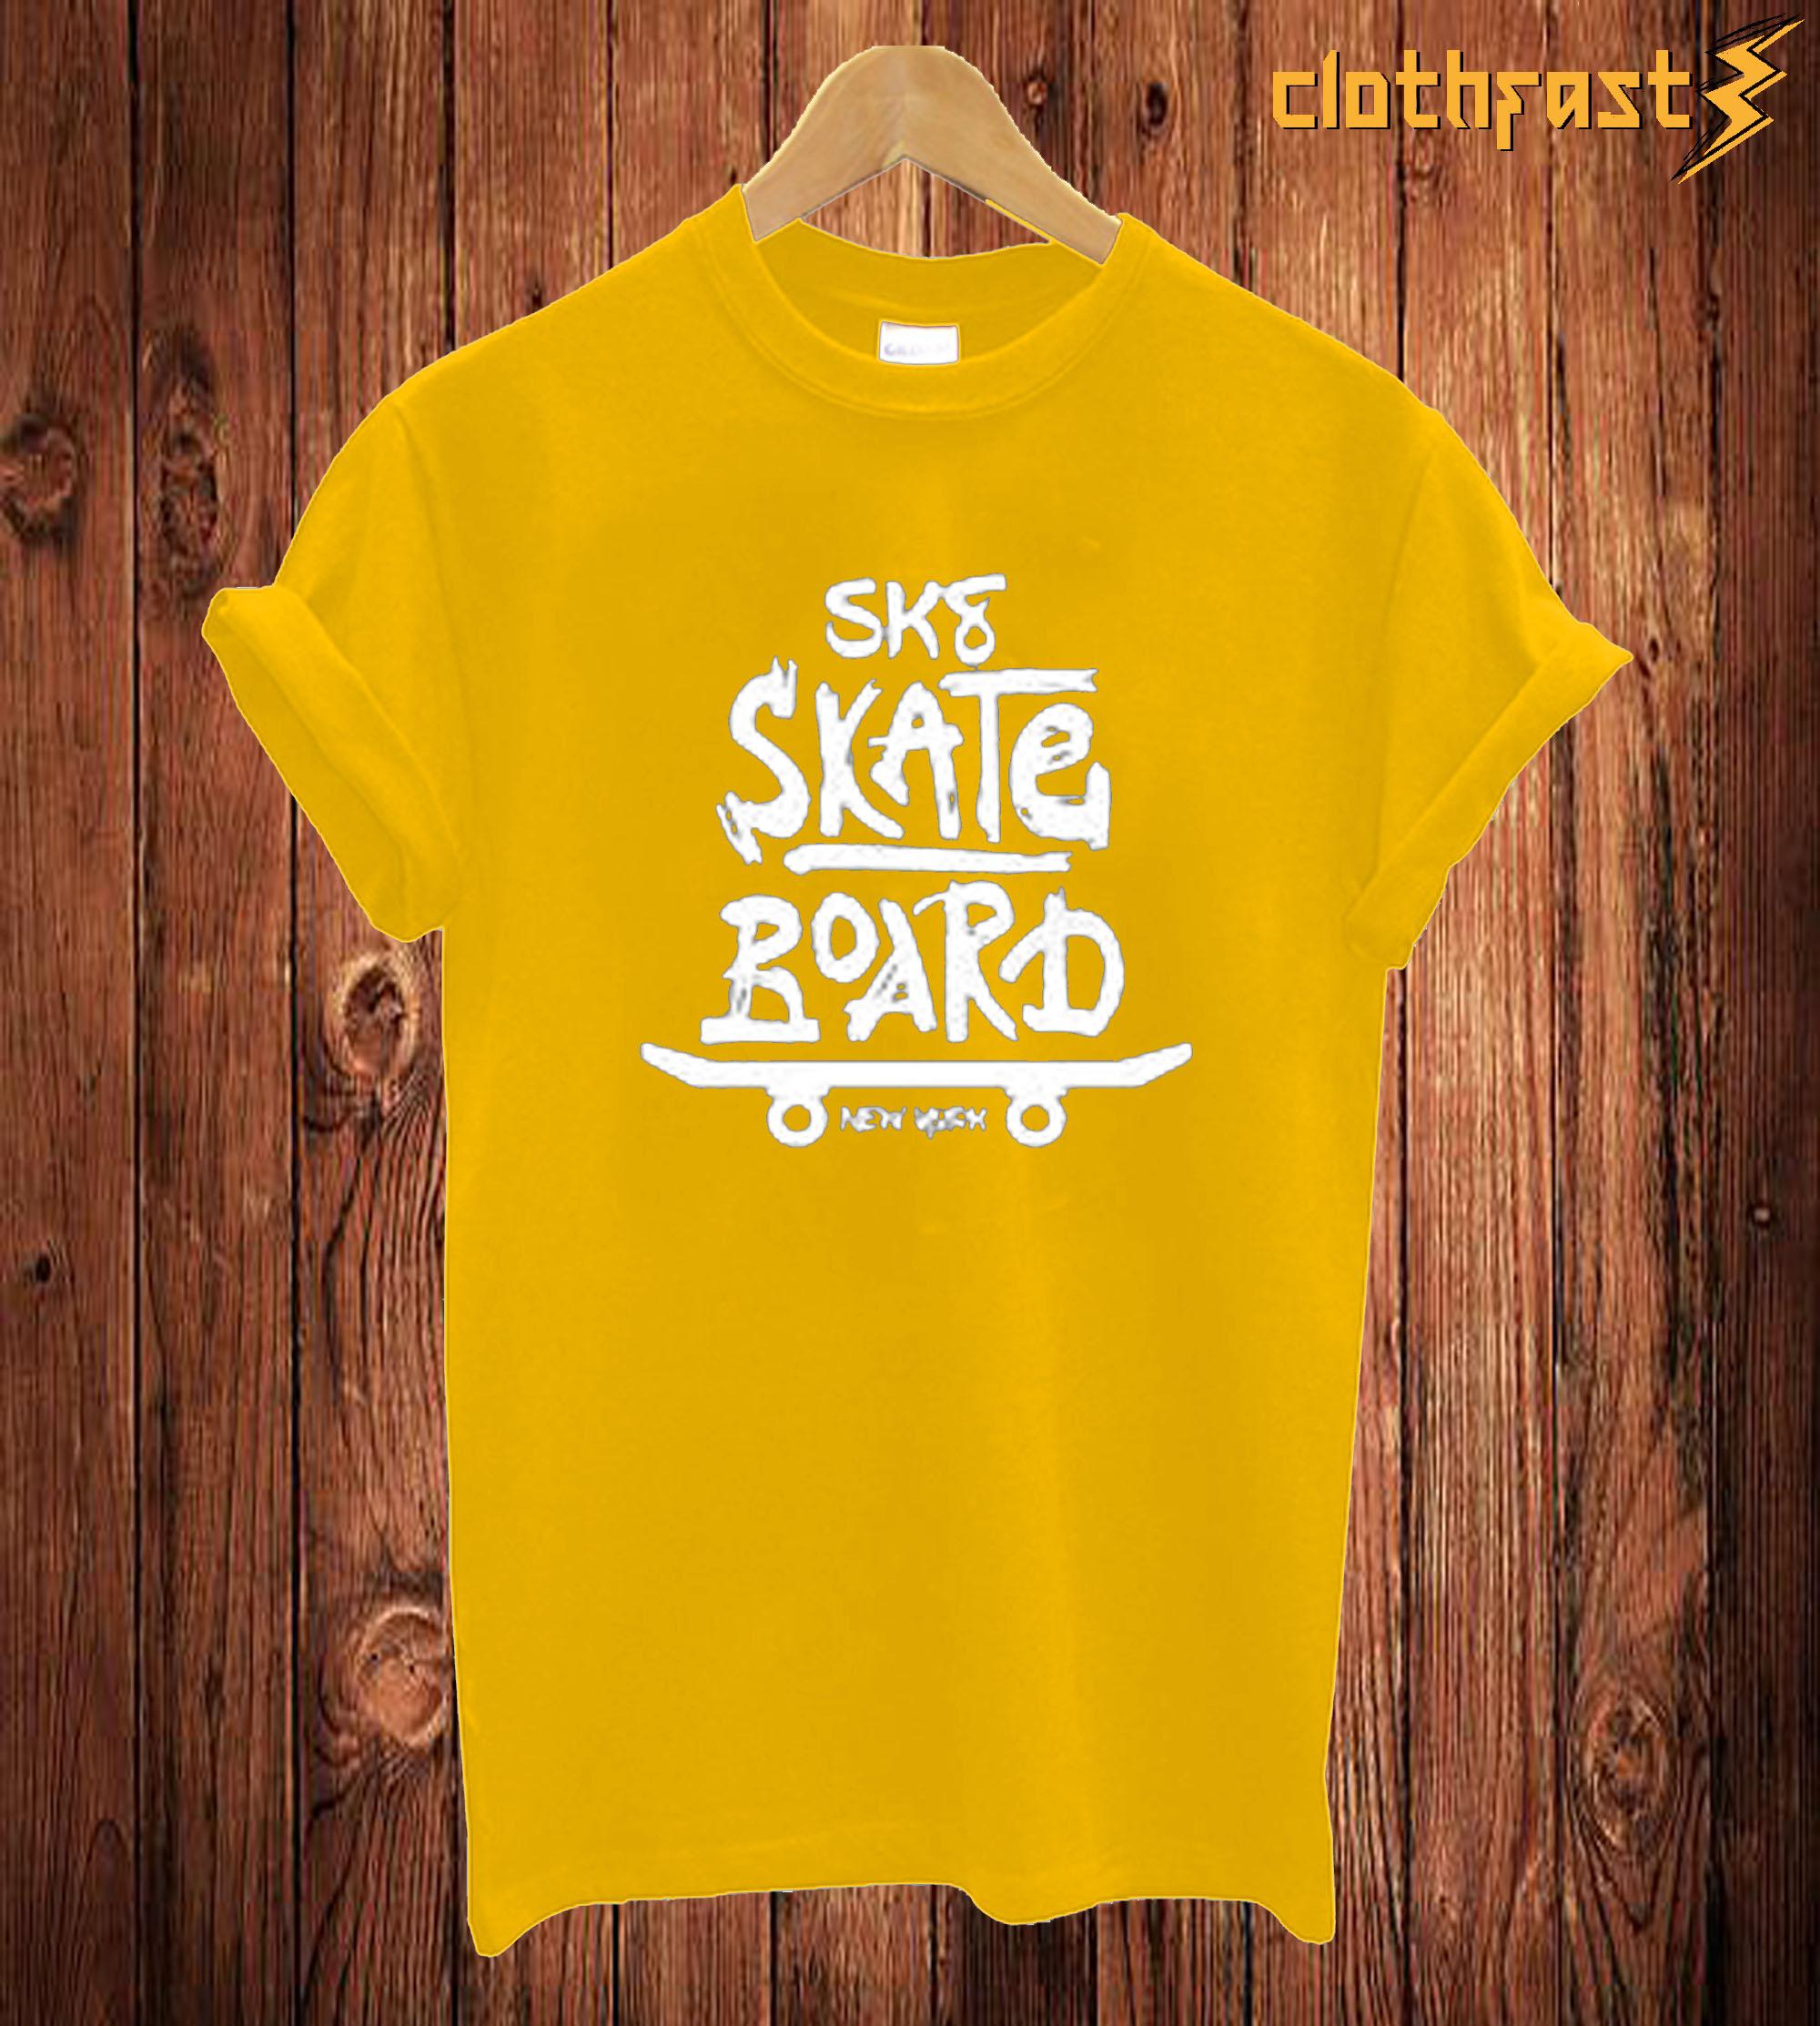 SKS Skate Board T Shirt